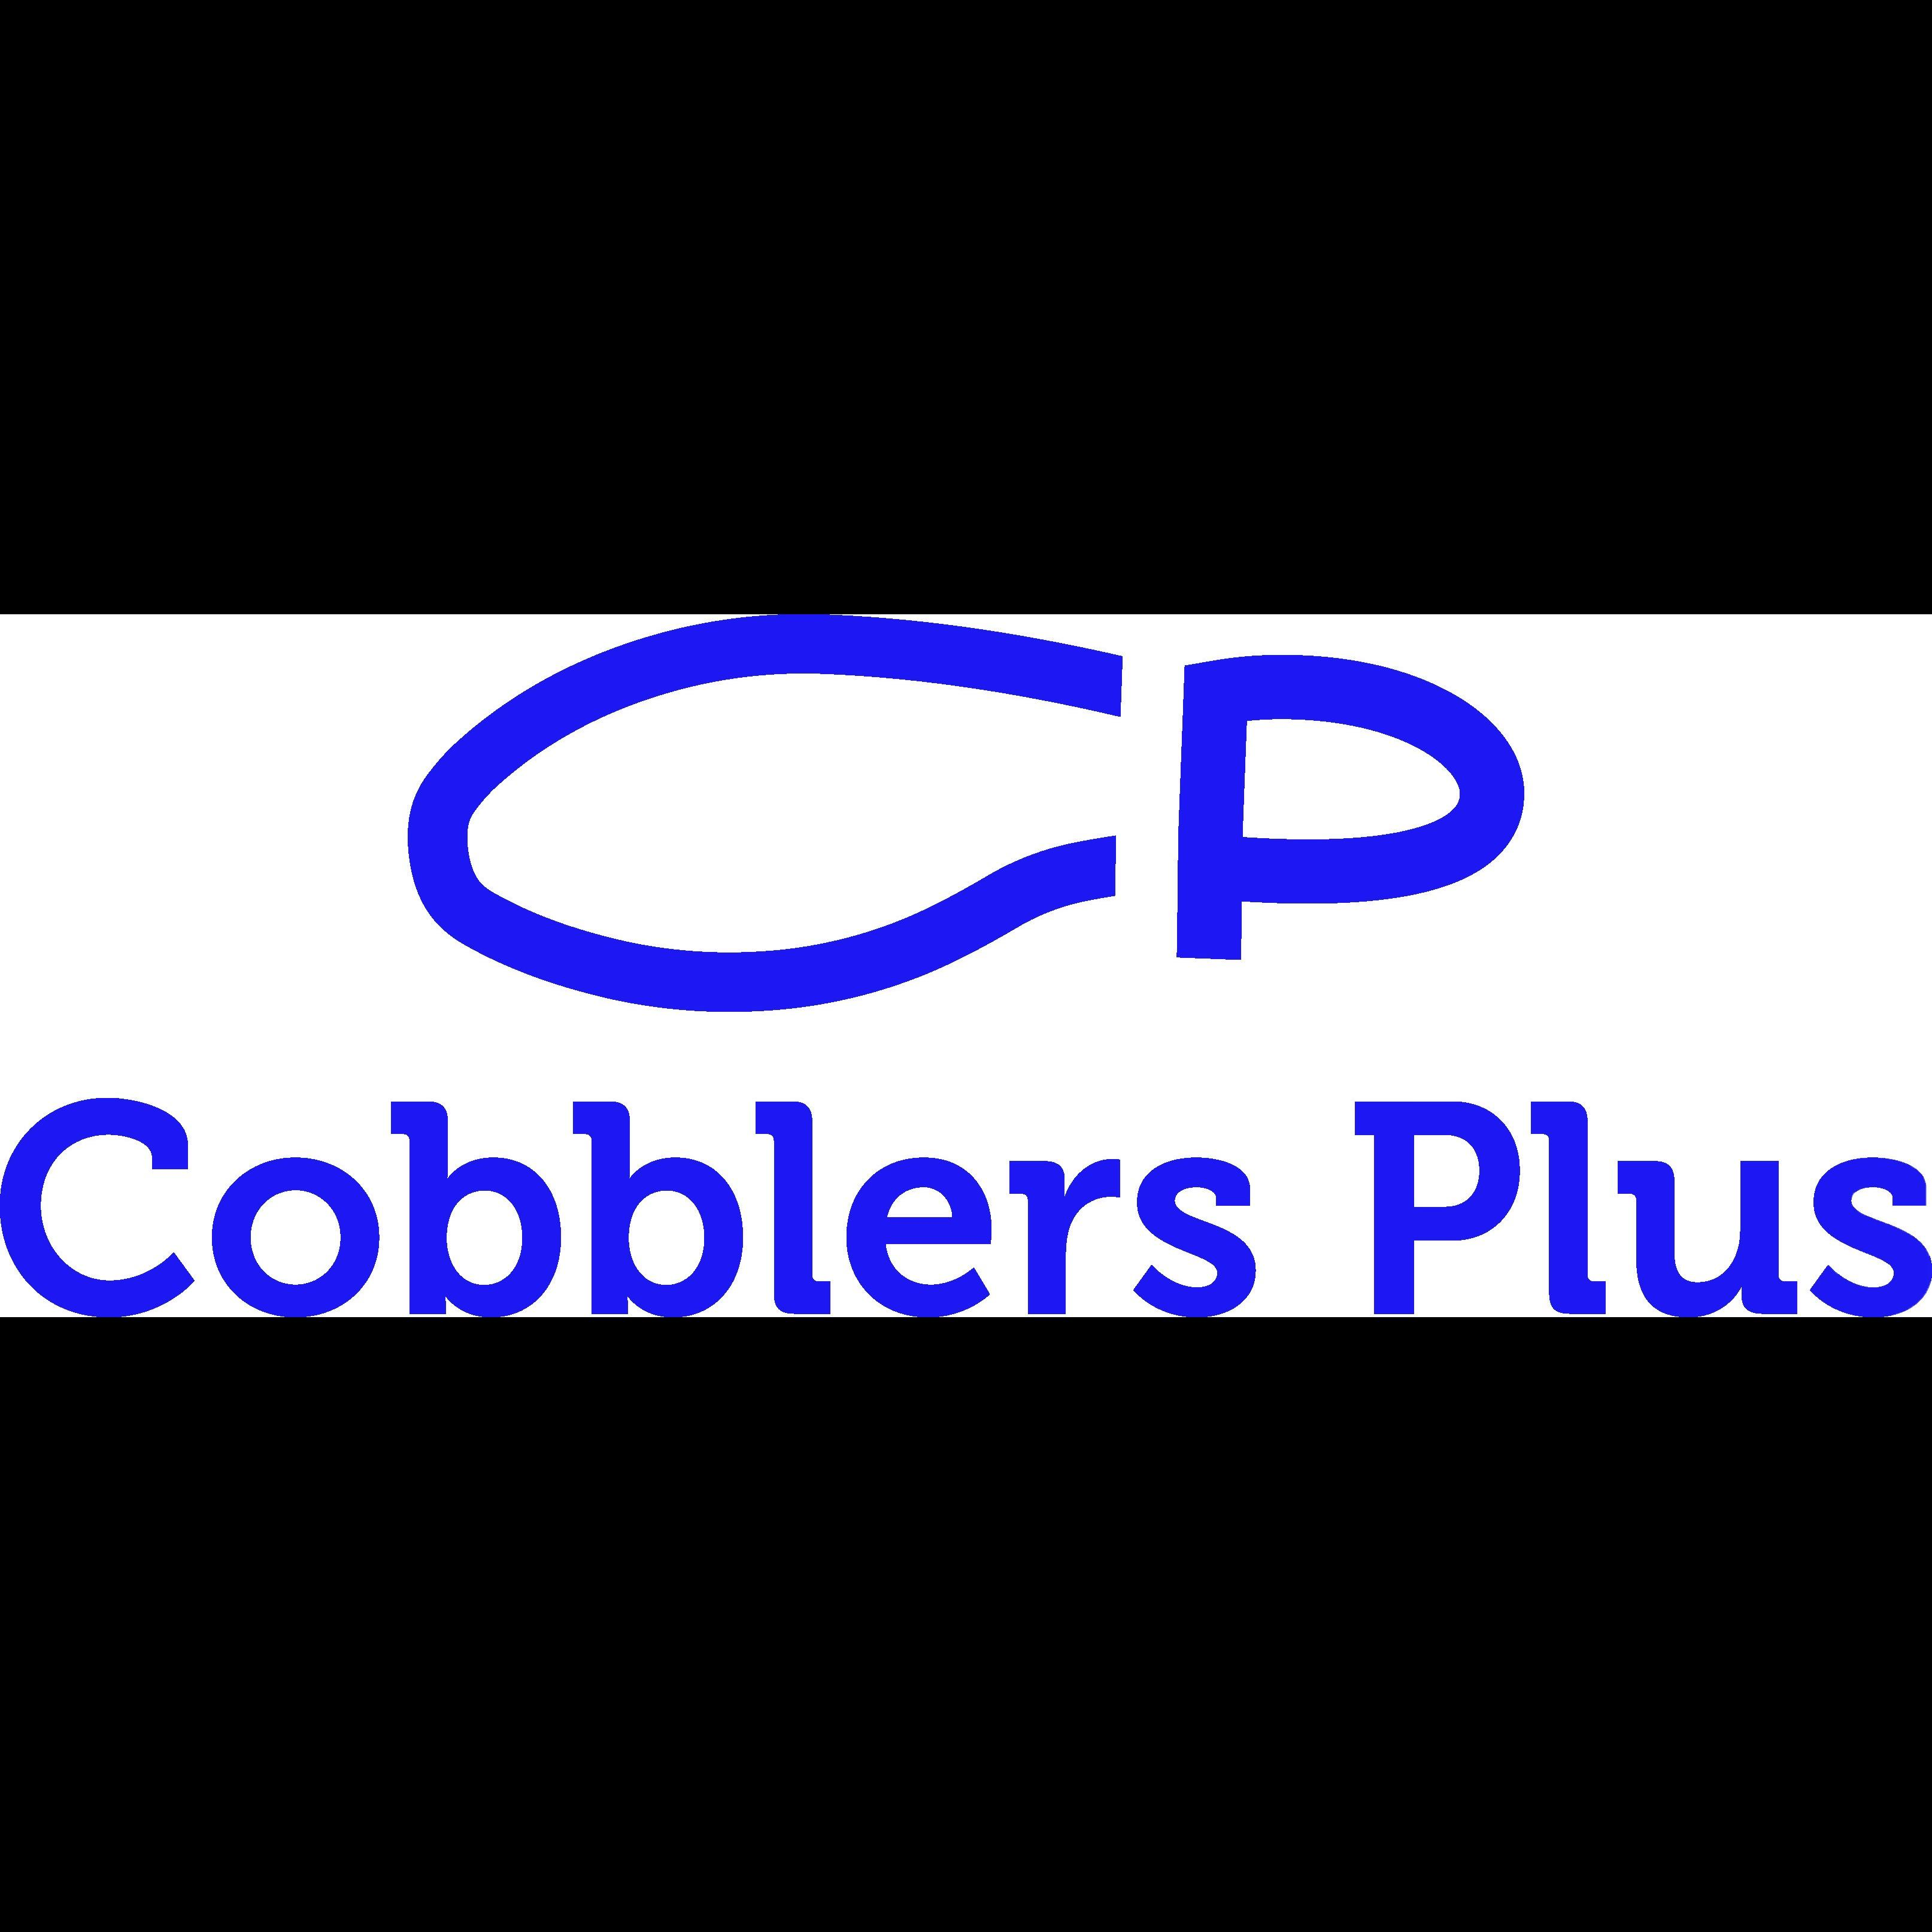 Cobblers Plus